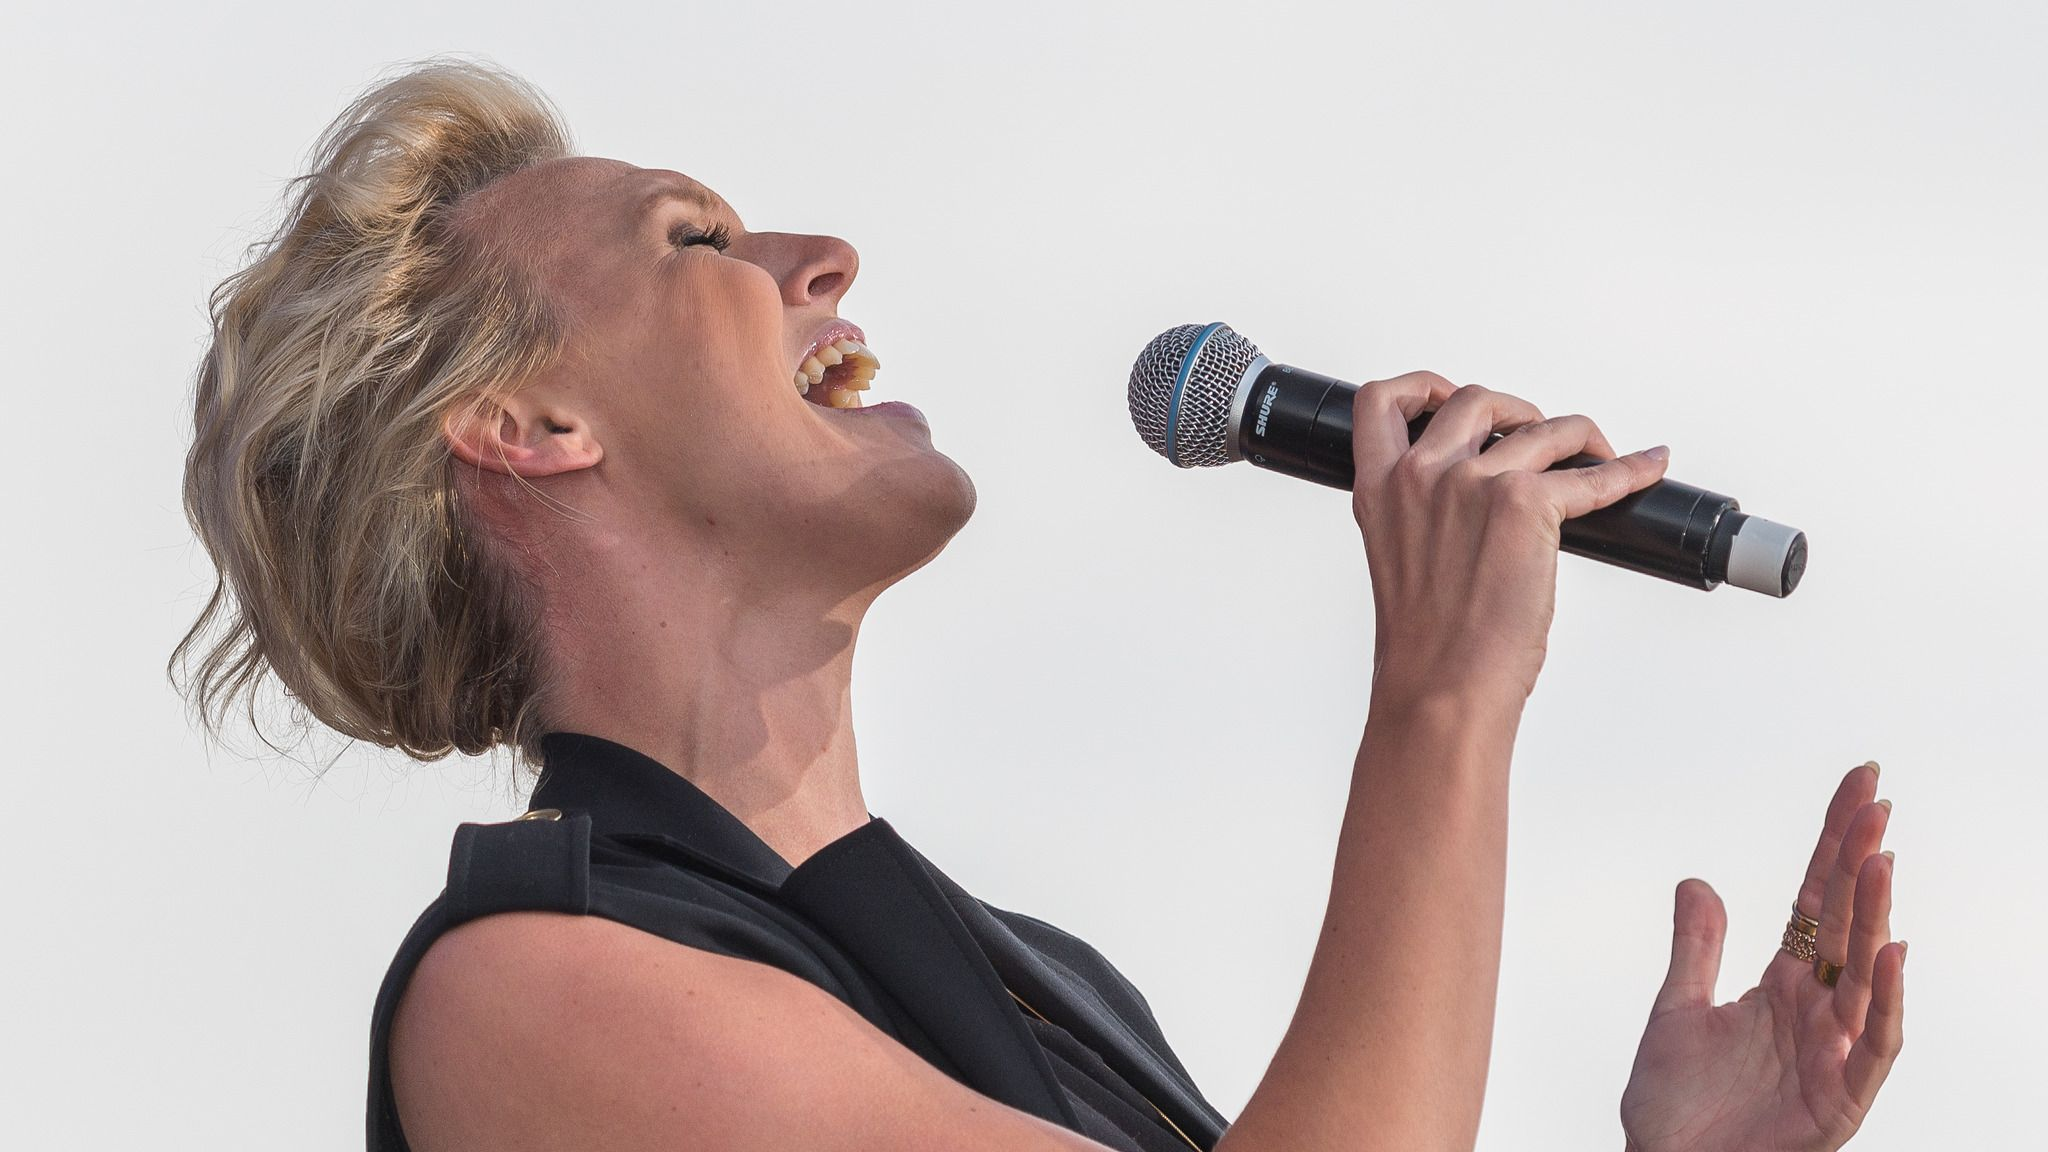 Mitt Sanna jag - Sanna Nielsen